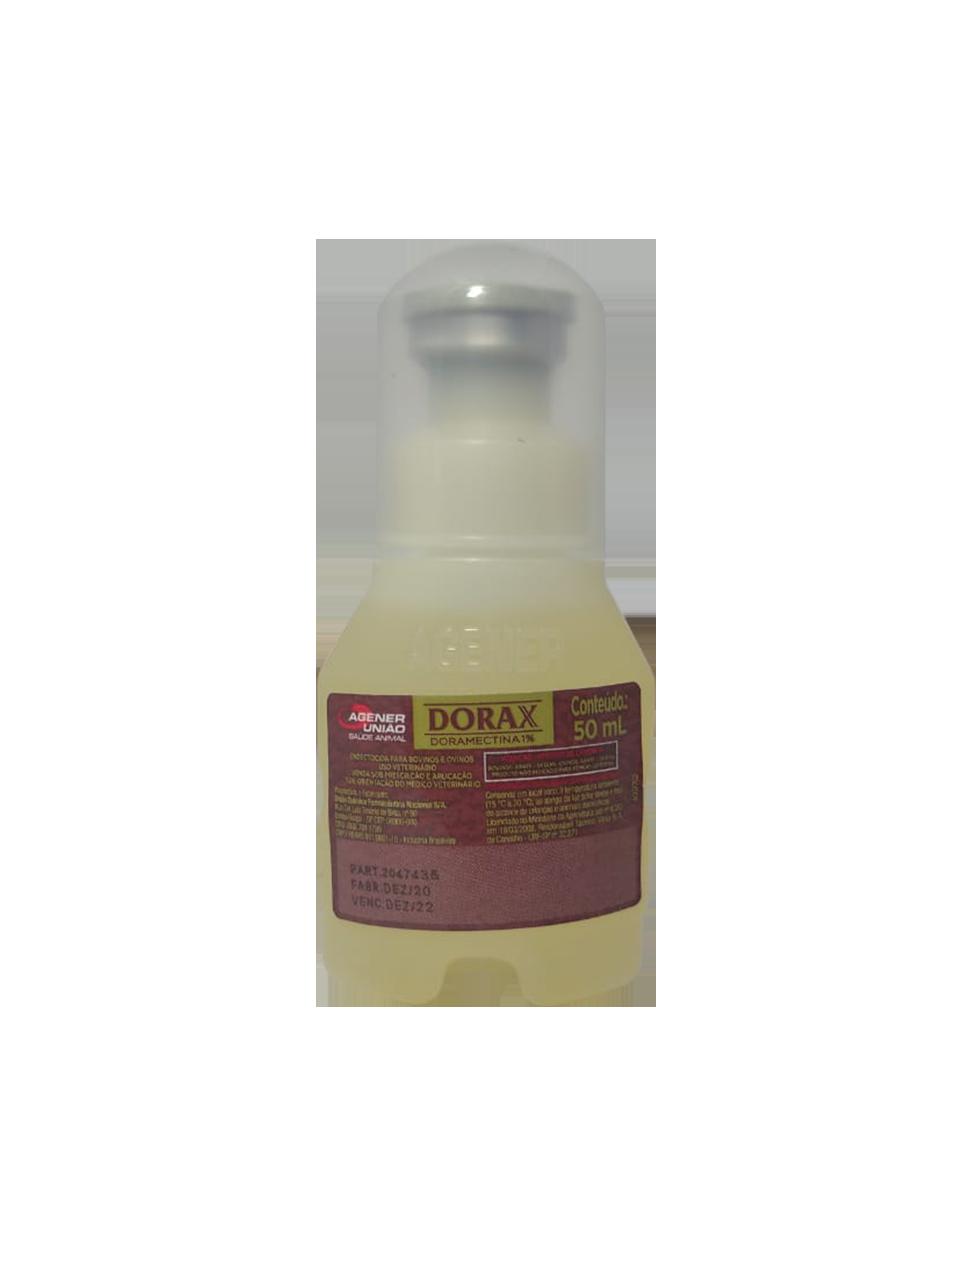 Dorax - Doramectina 1% - 50ml - Agener